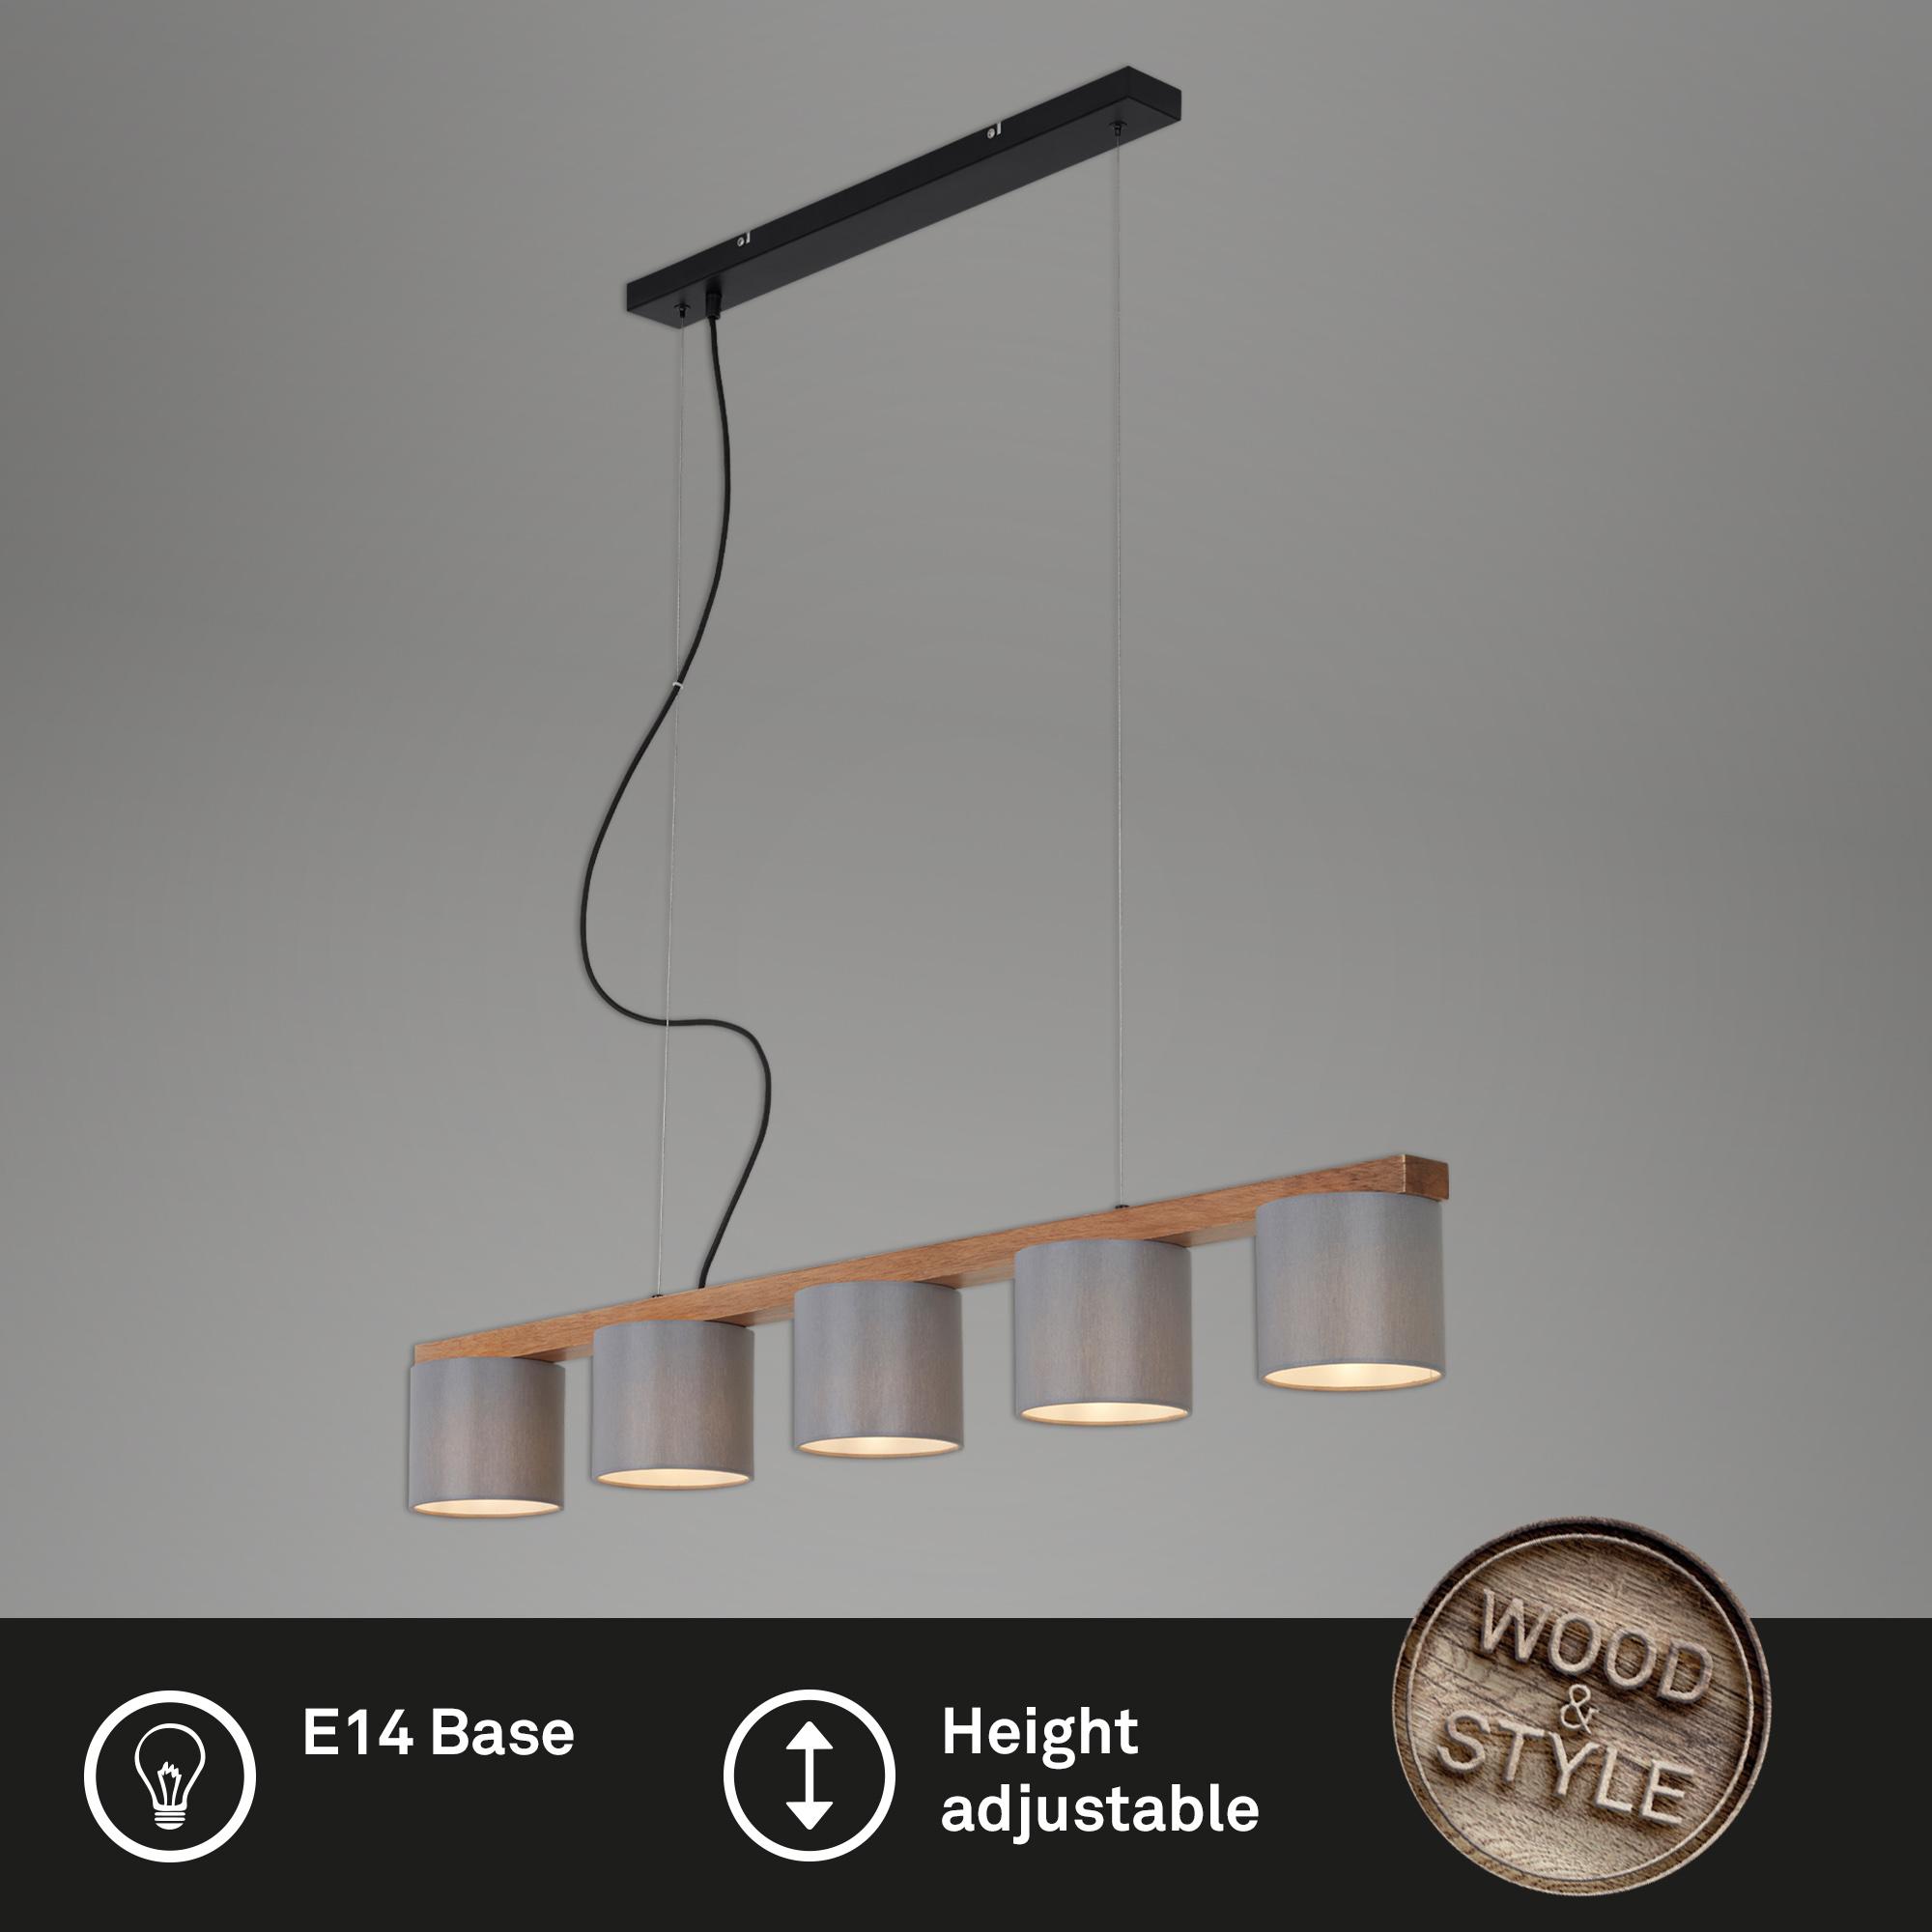 LED Pendelleuchte, 110 cm, max. 25 W, Grau